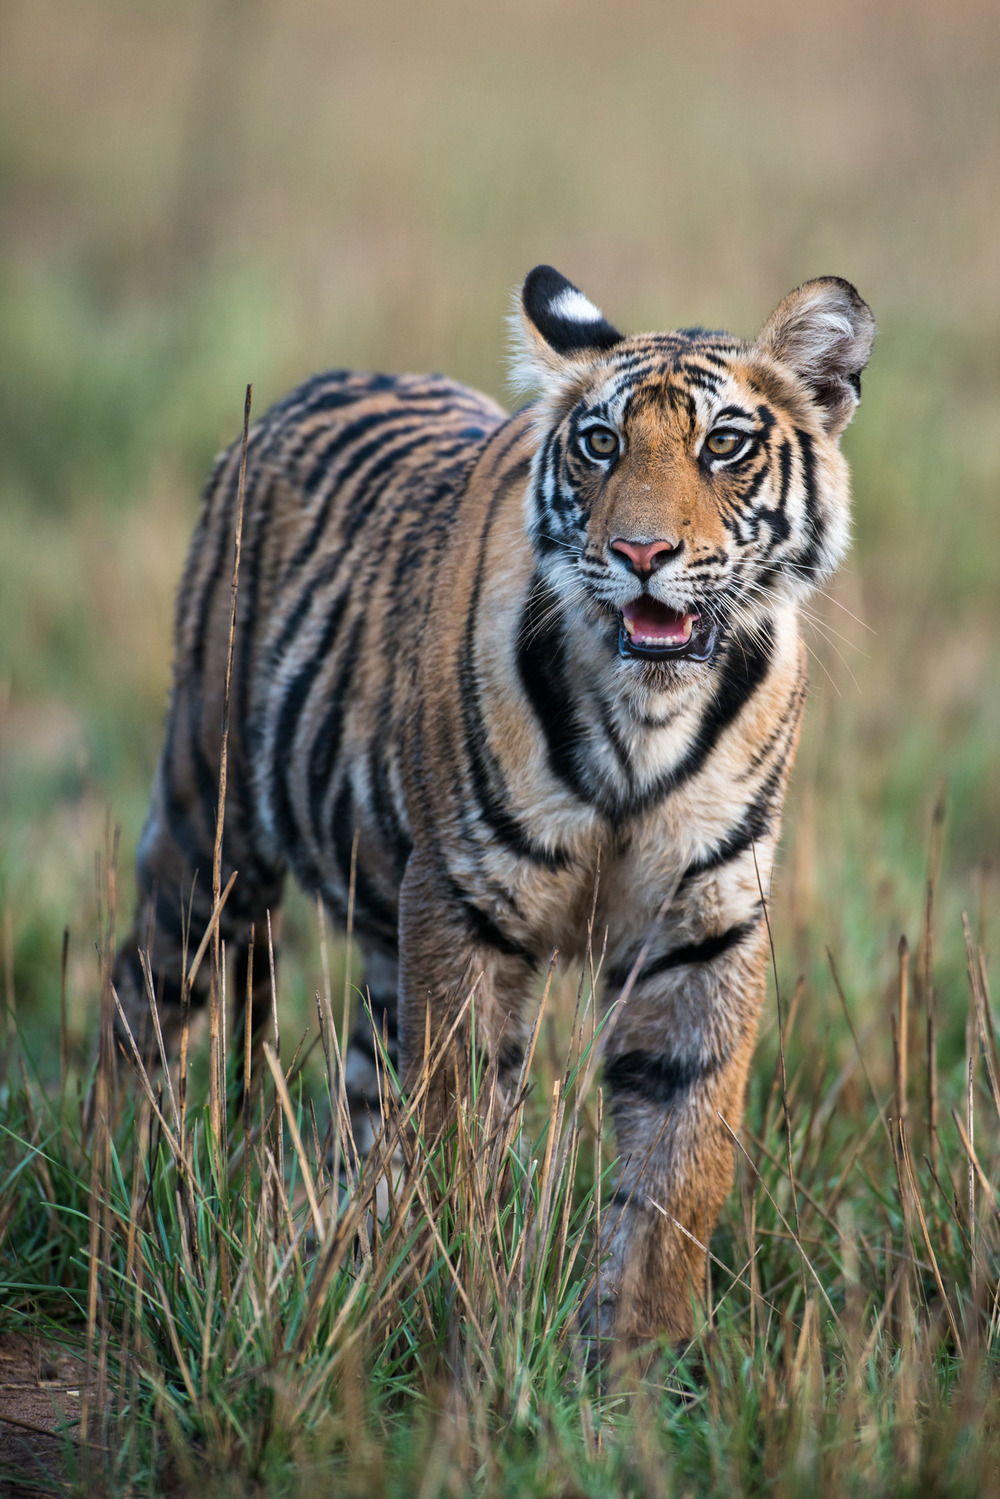 Bengal tiger cub, Bandhavgarh National Park, Madhya Pradesh, India